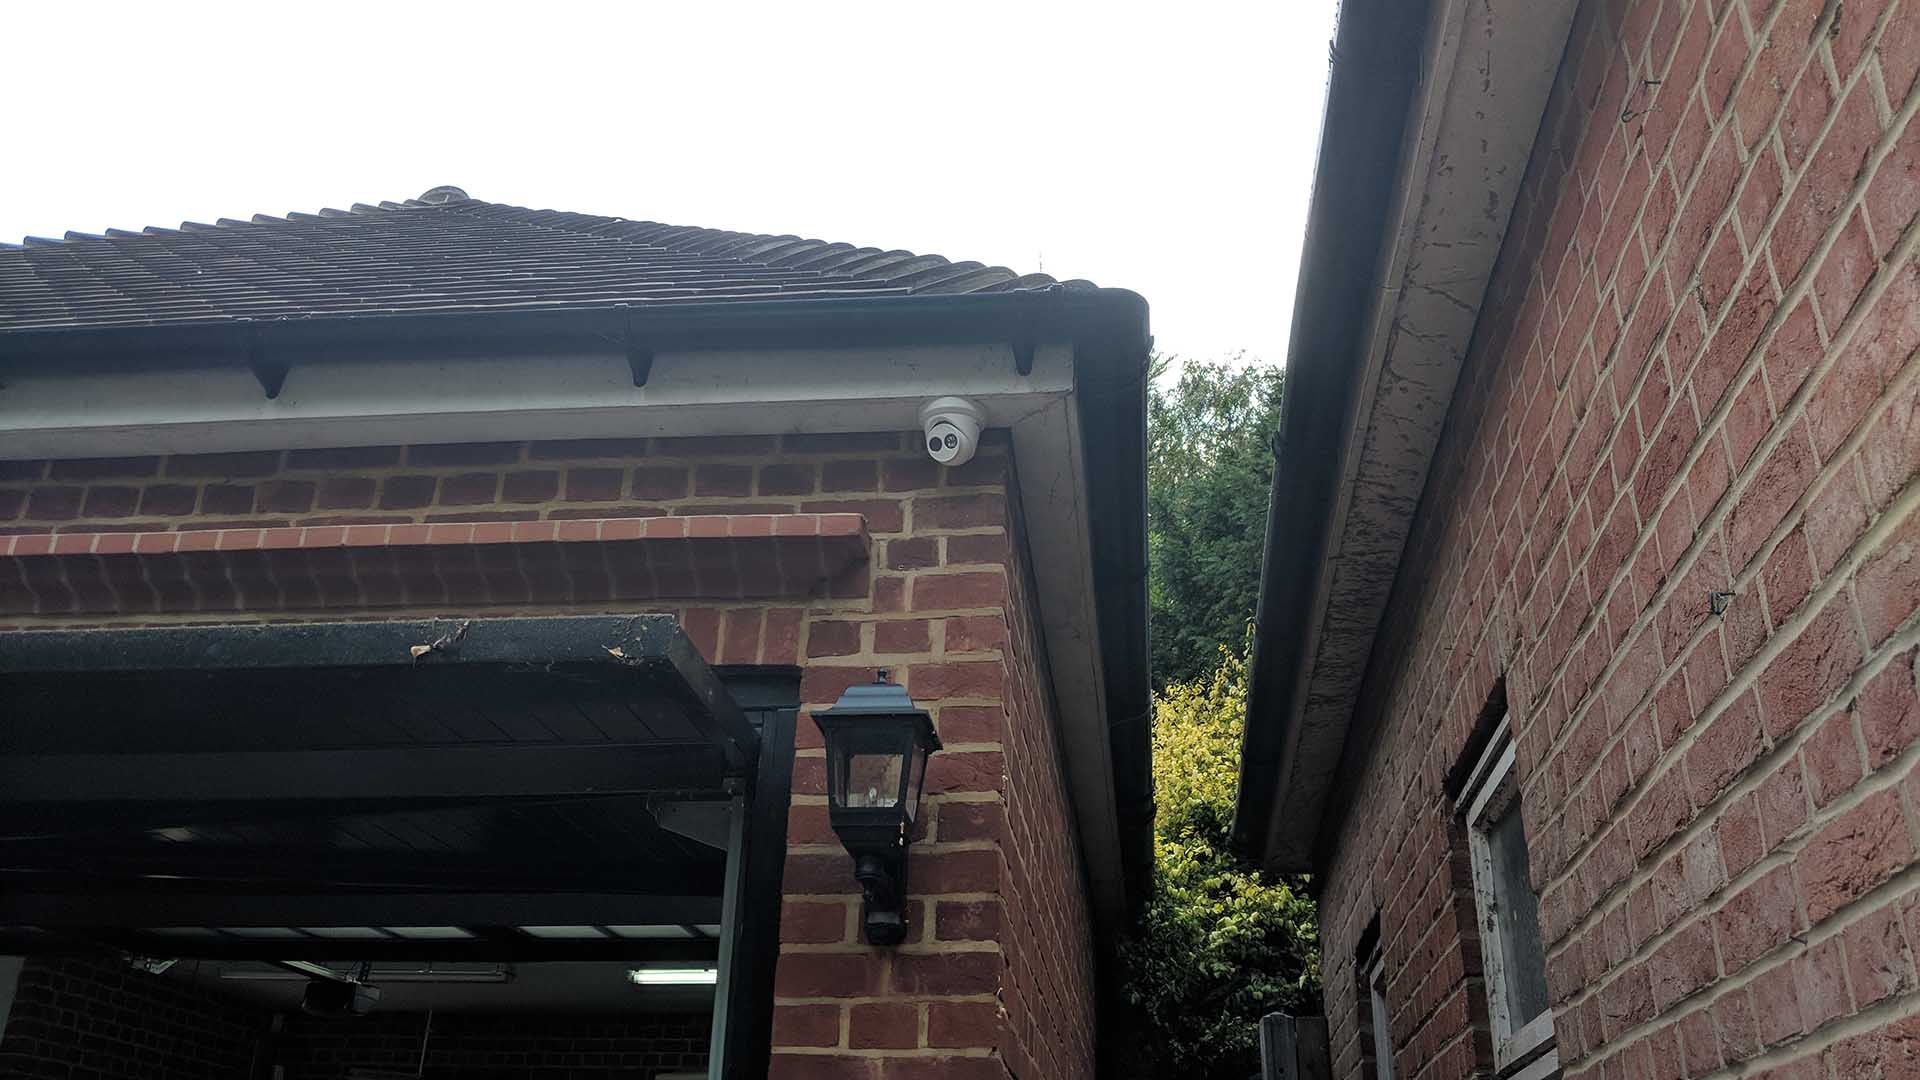 4K CCTV Installation in Chislehurst